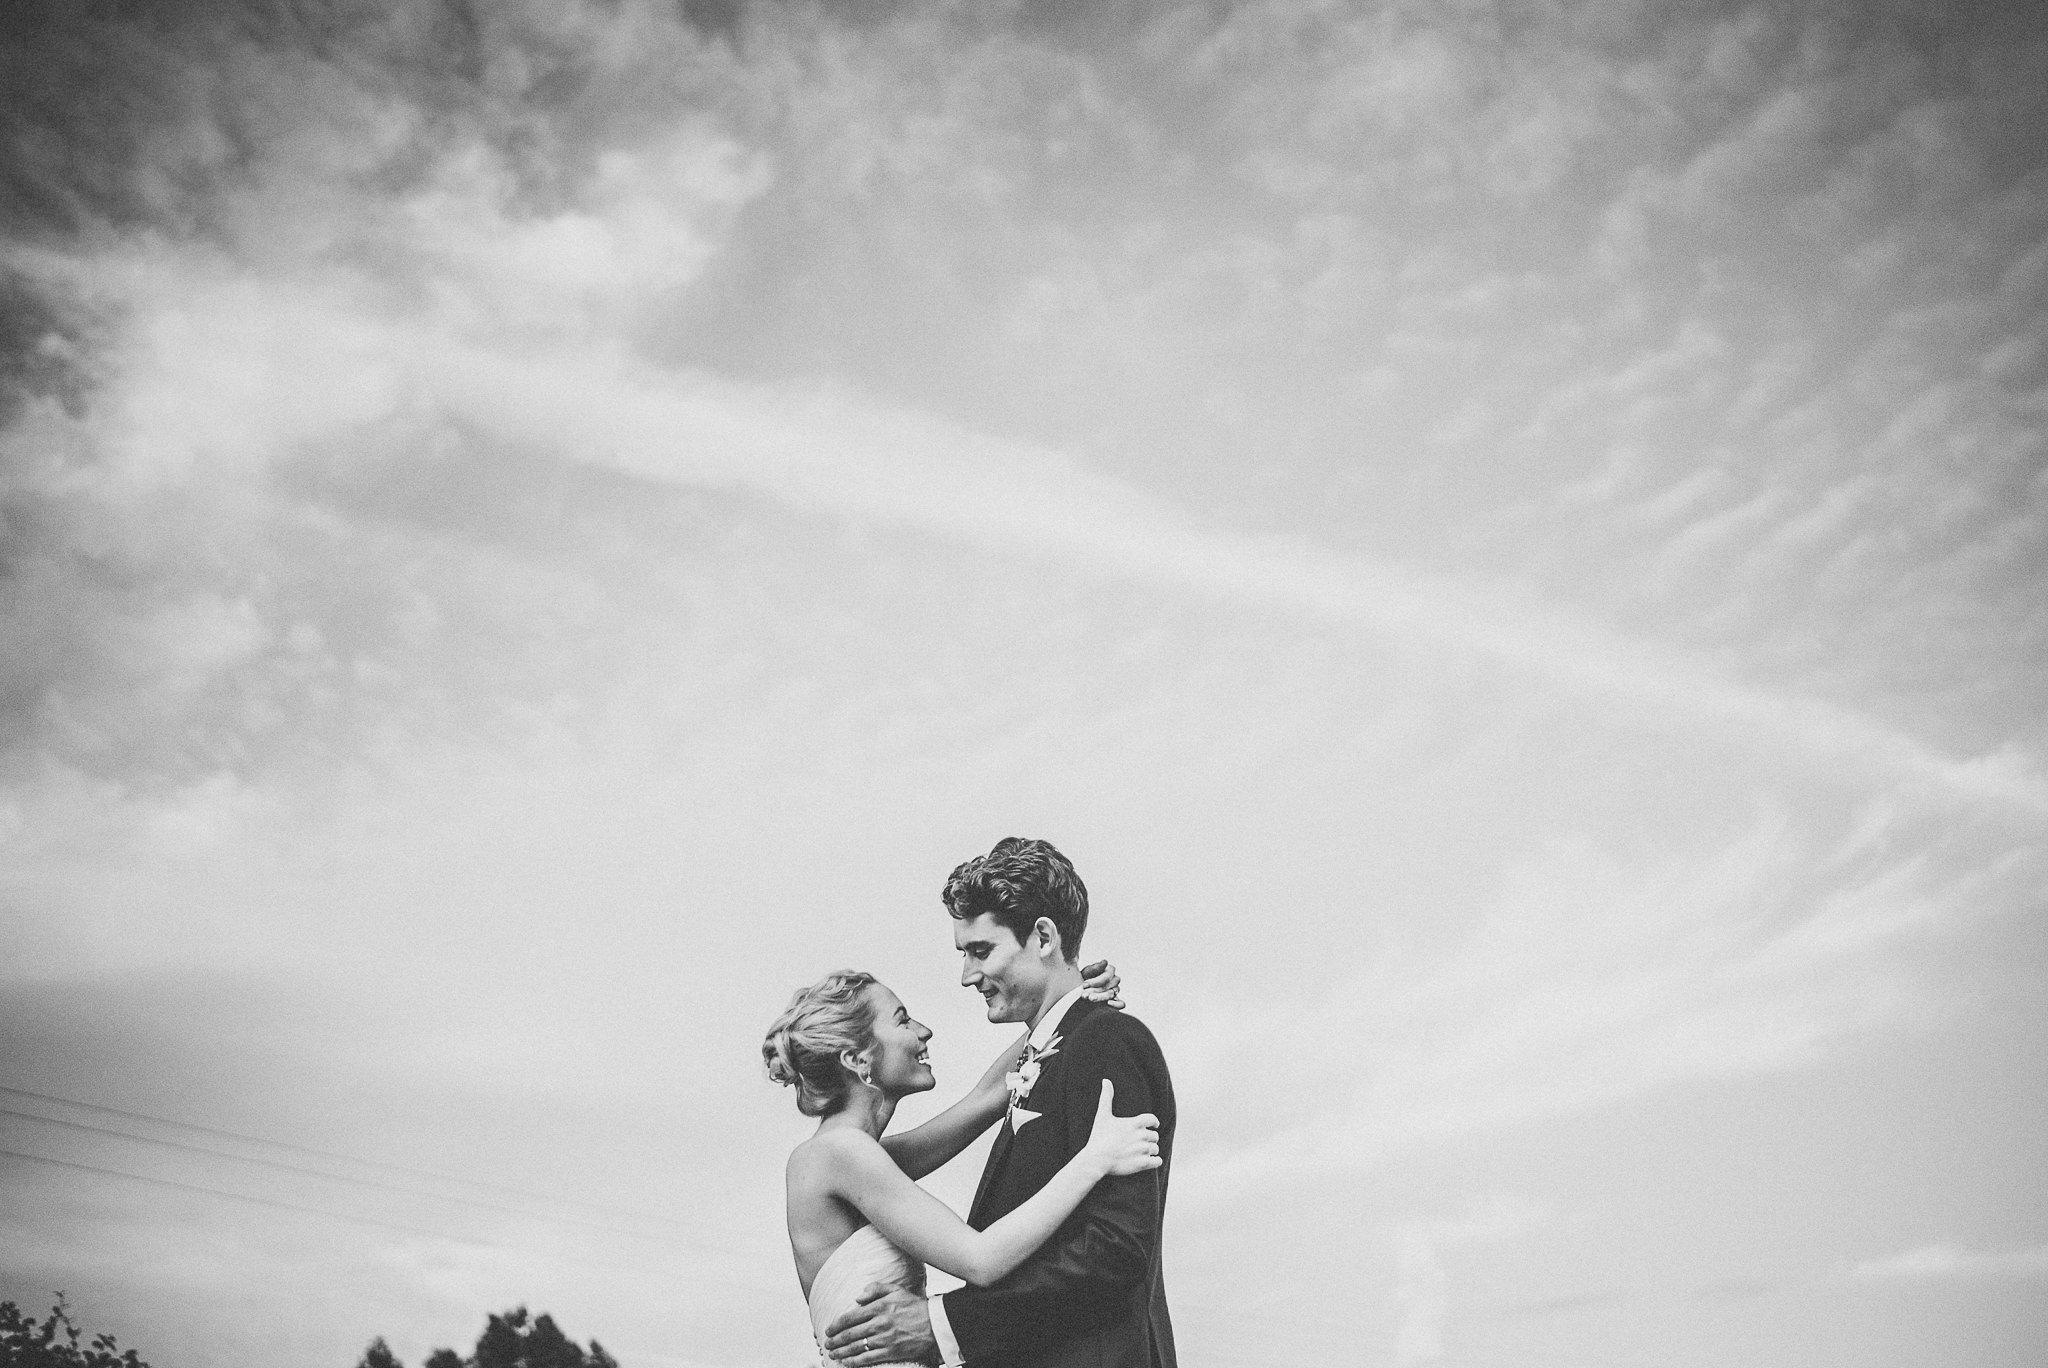 paul-marbrook-Gaynes-Park Wedding-Photographer-90135